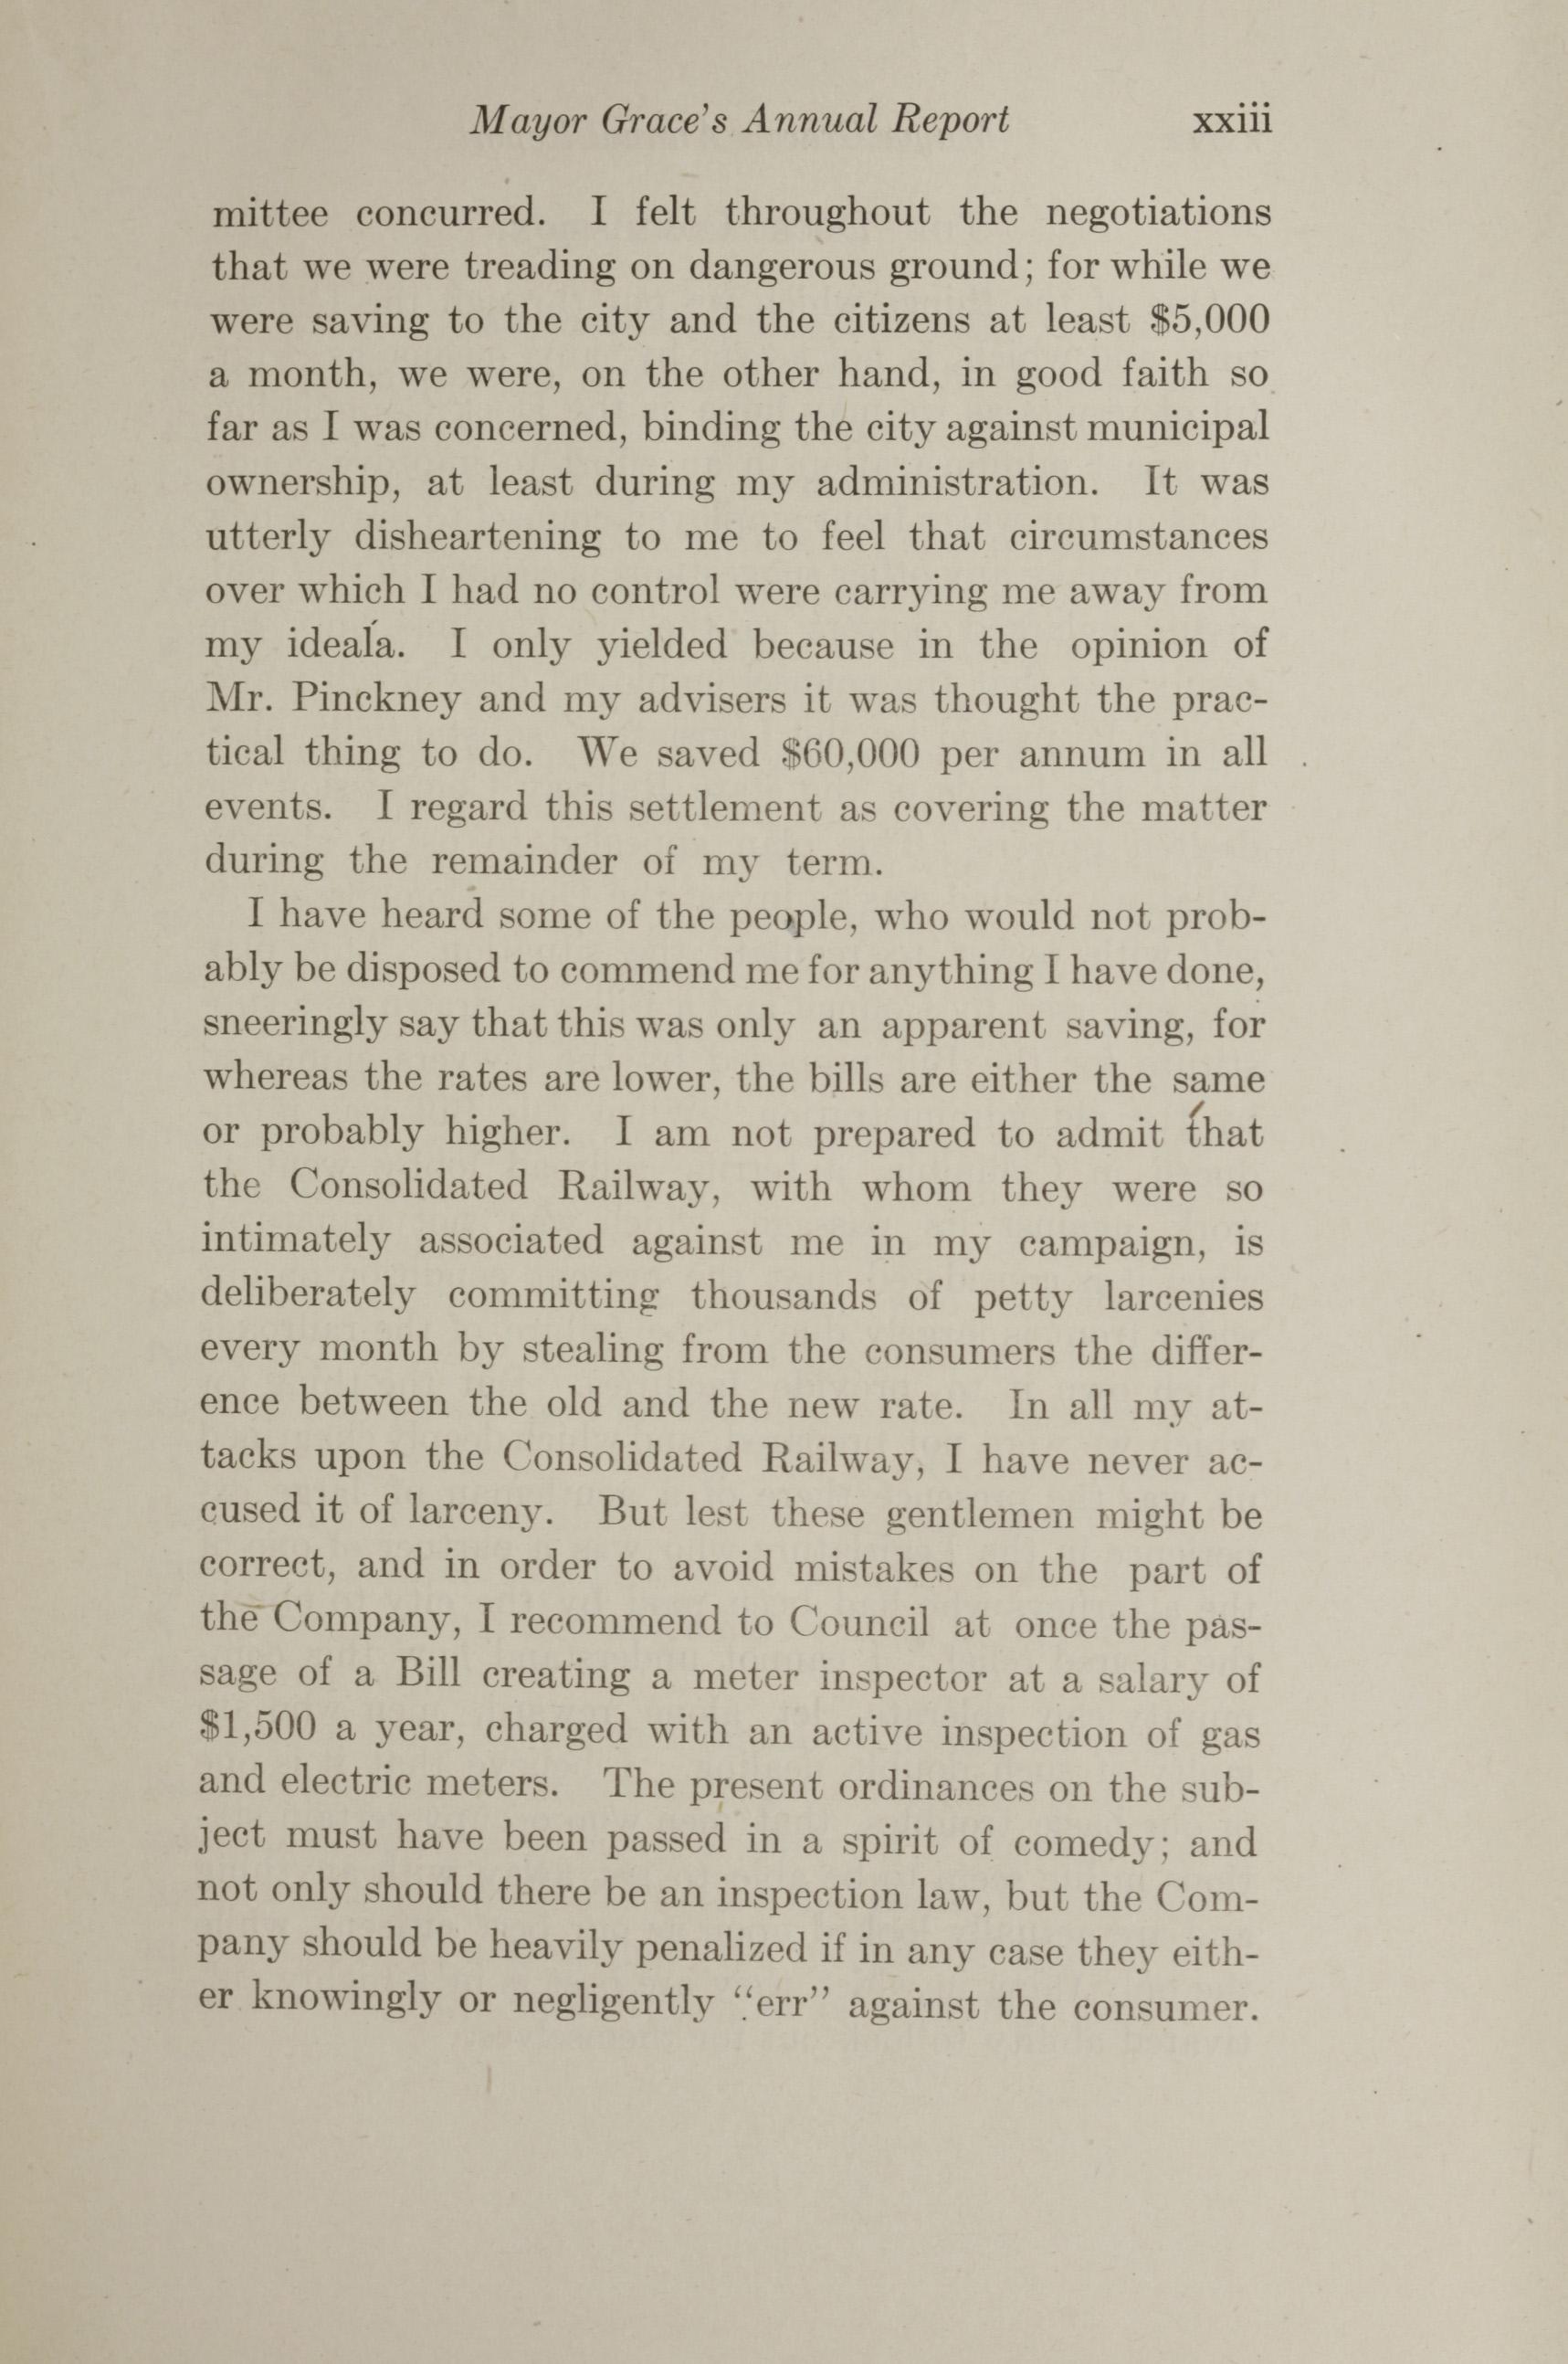 Charleston Yearbook, 1912, page xxiii